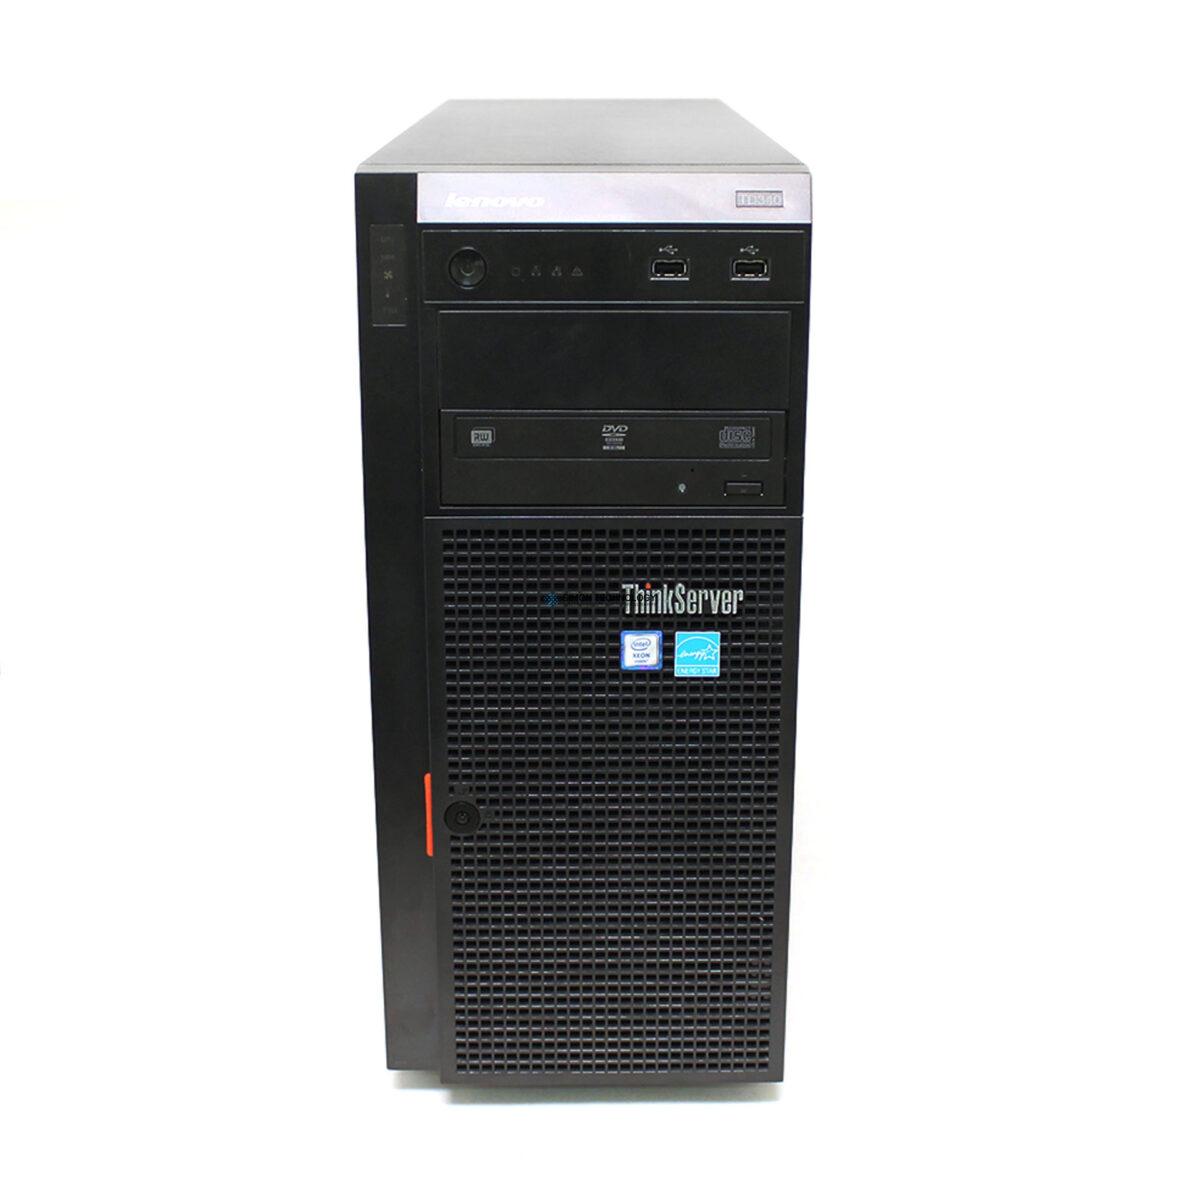 Сервер Lenovo 2x 6C Xeon E5-2430 v2 2,5GHz 16GB 16xSFF (ThinkServer TD340)